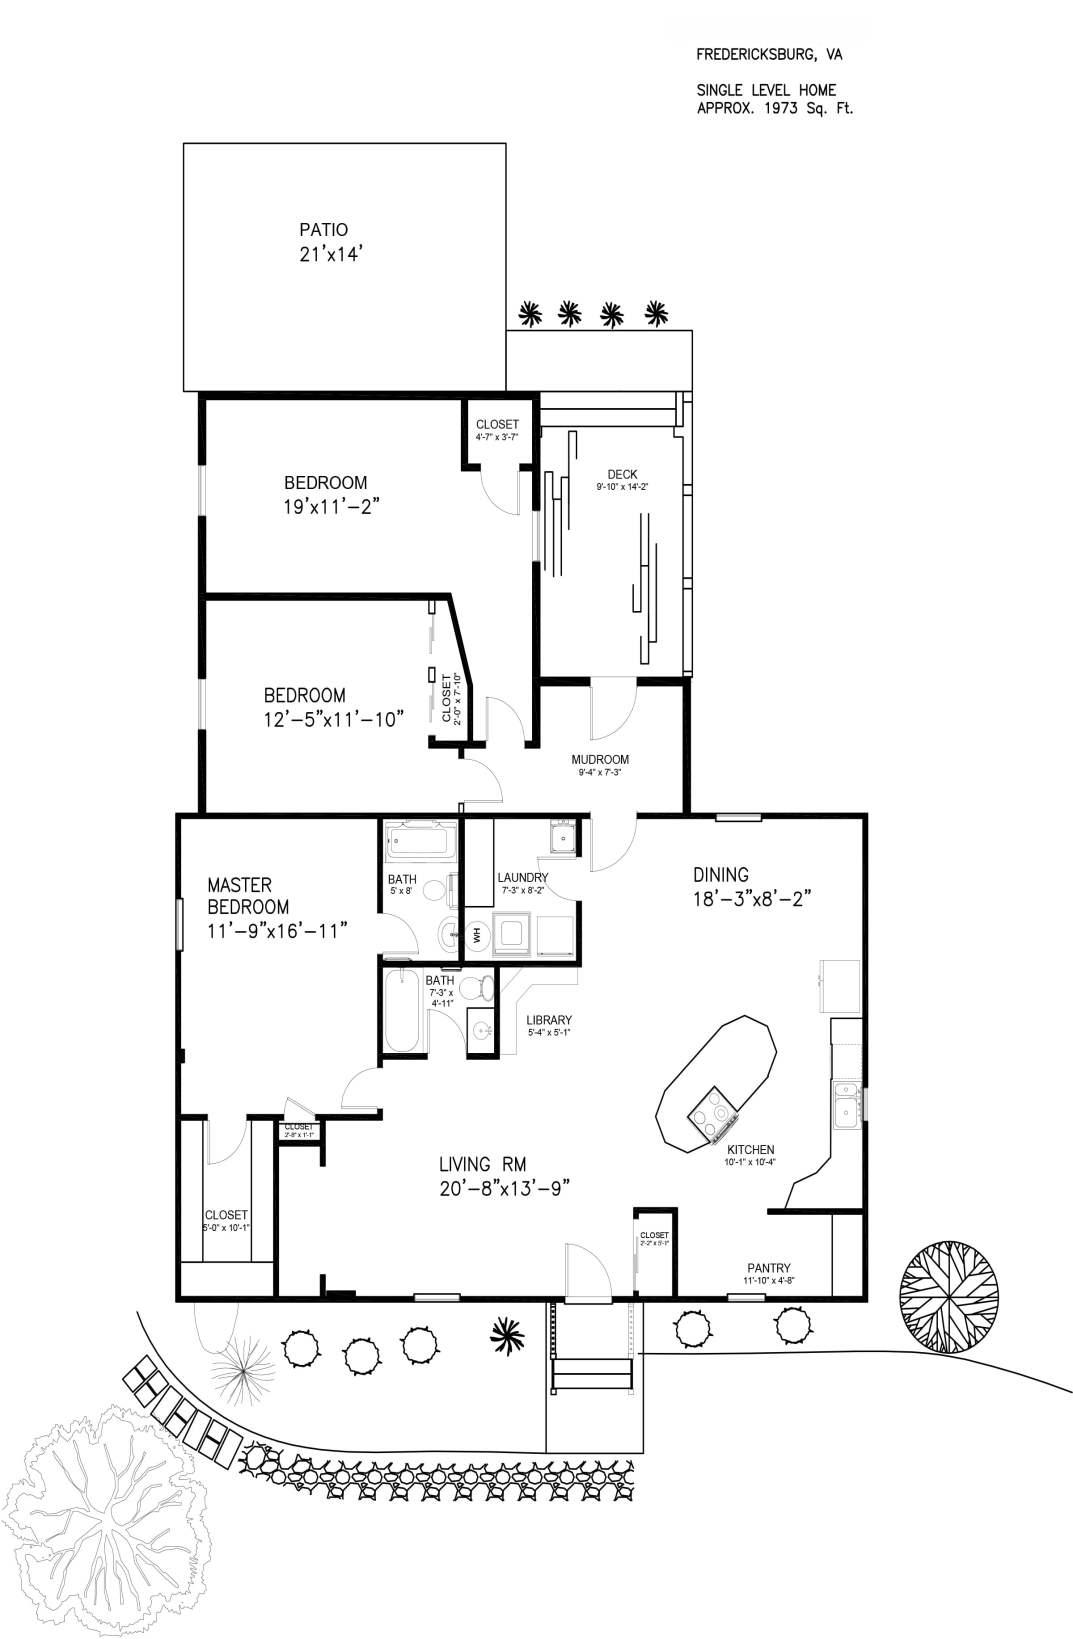 Floor Plan - Northern Virginia Real Estate Photography